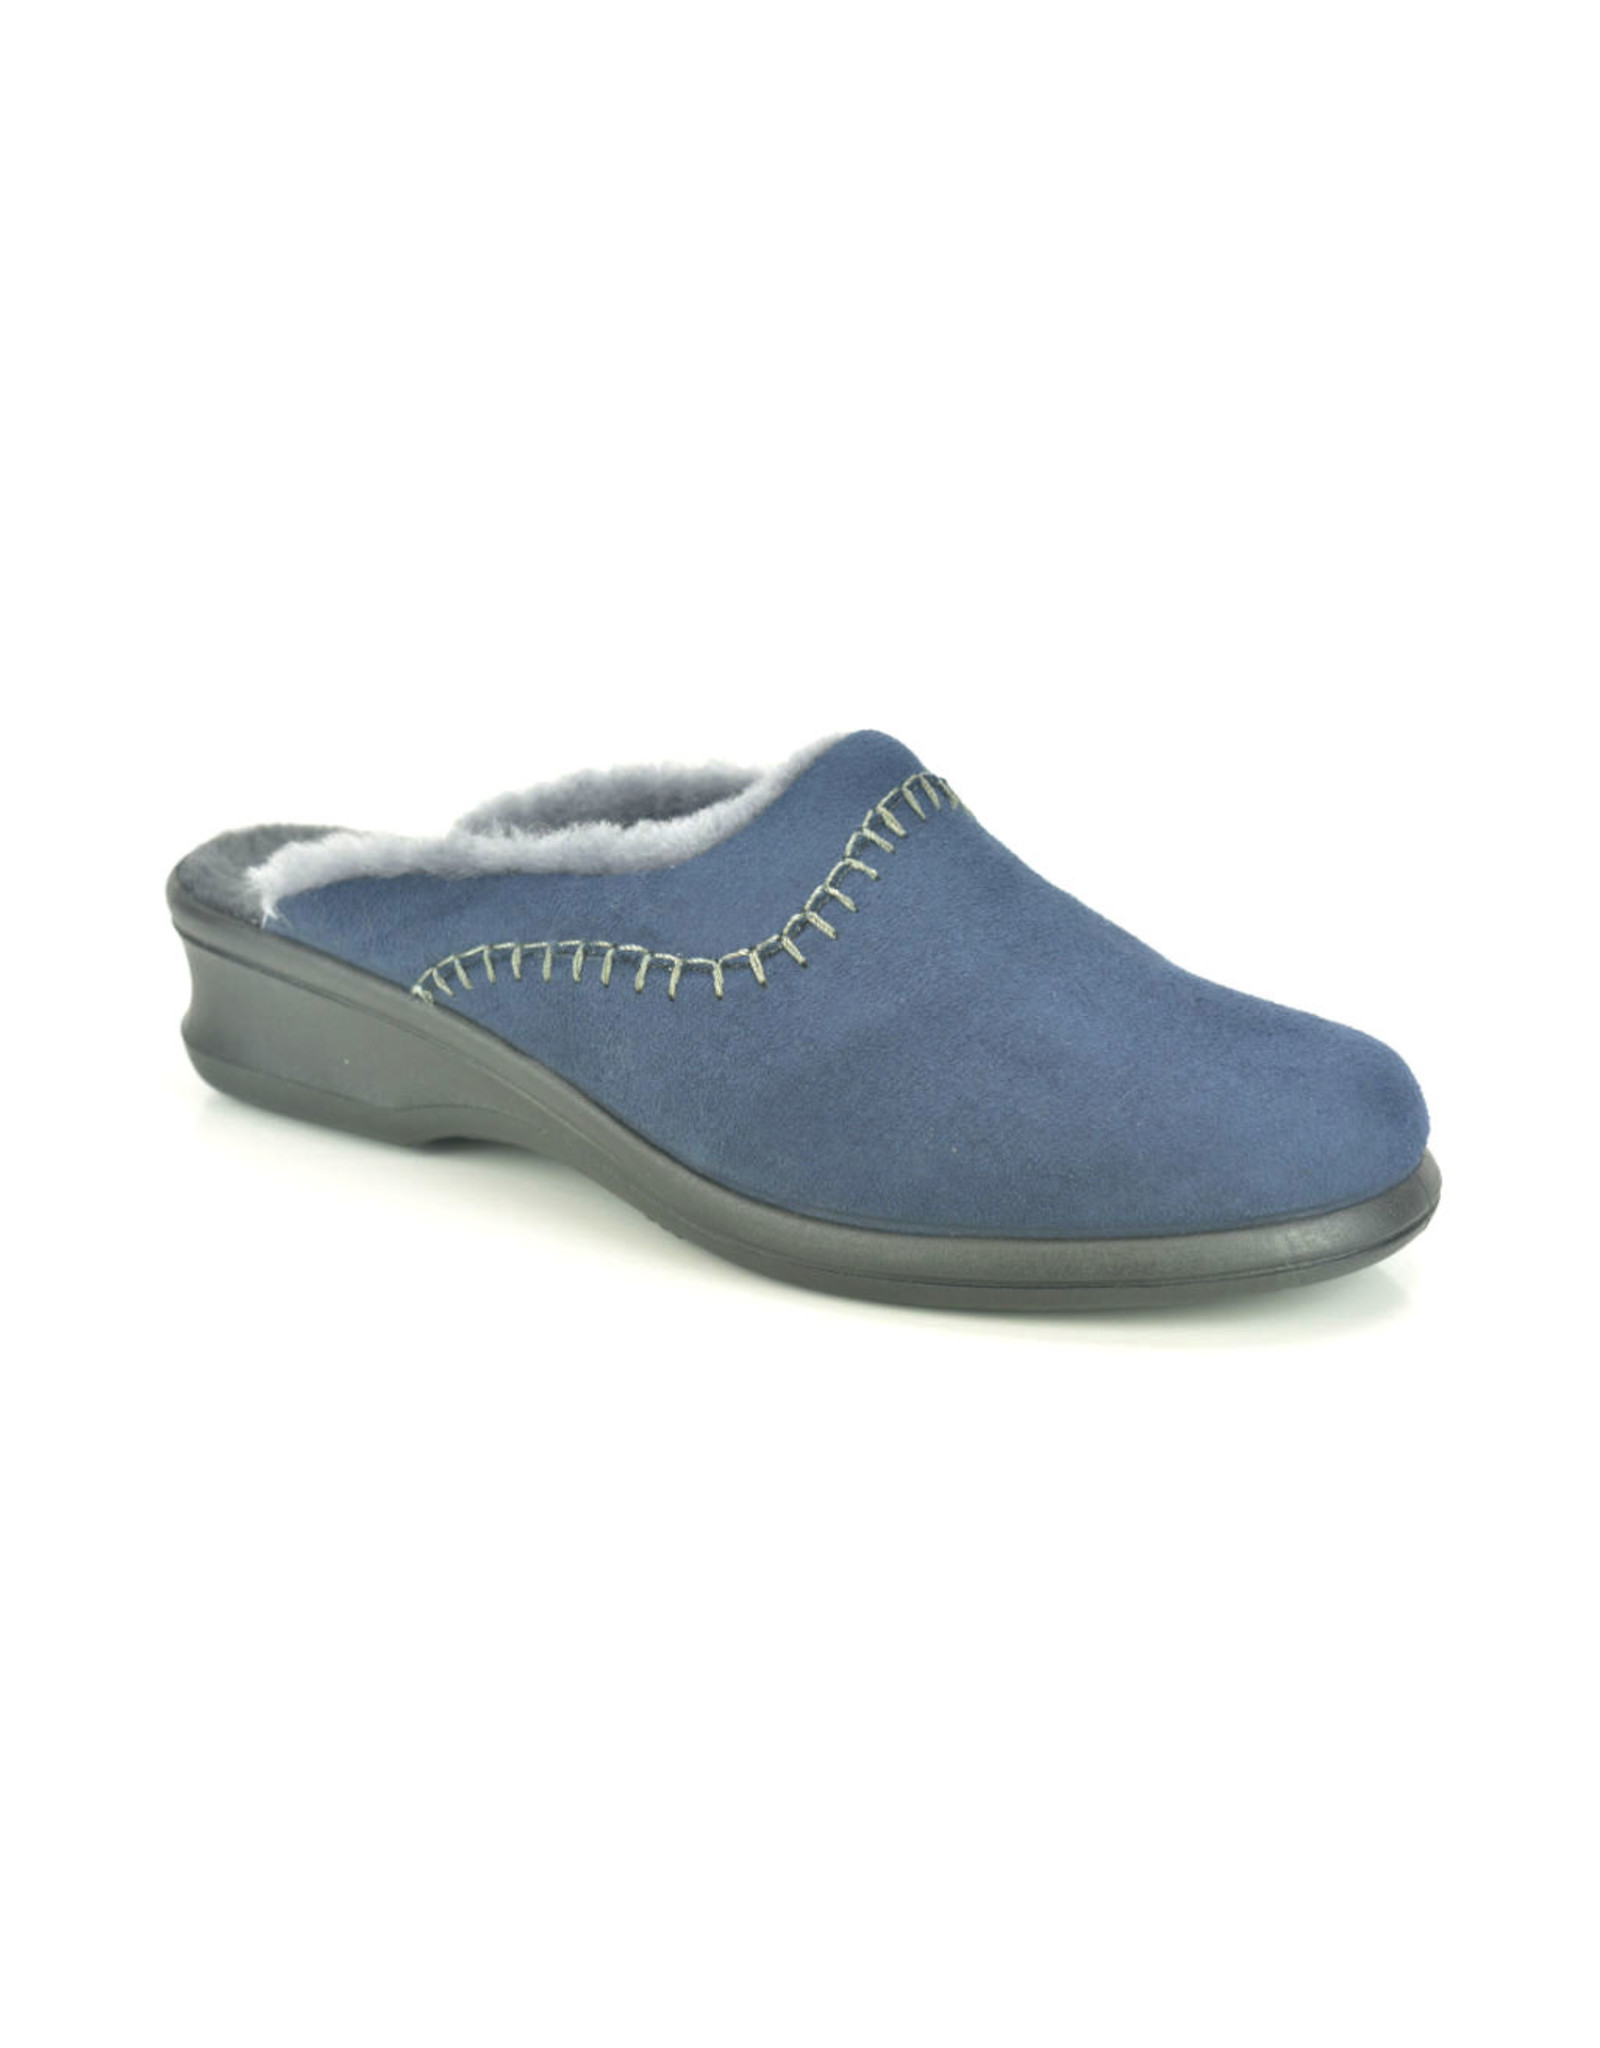 Rohde 9861 blauw